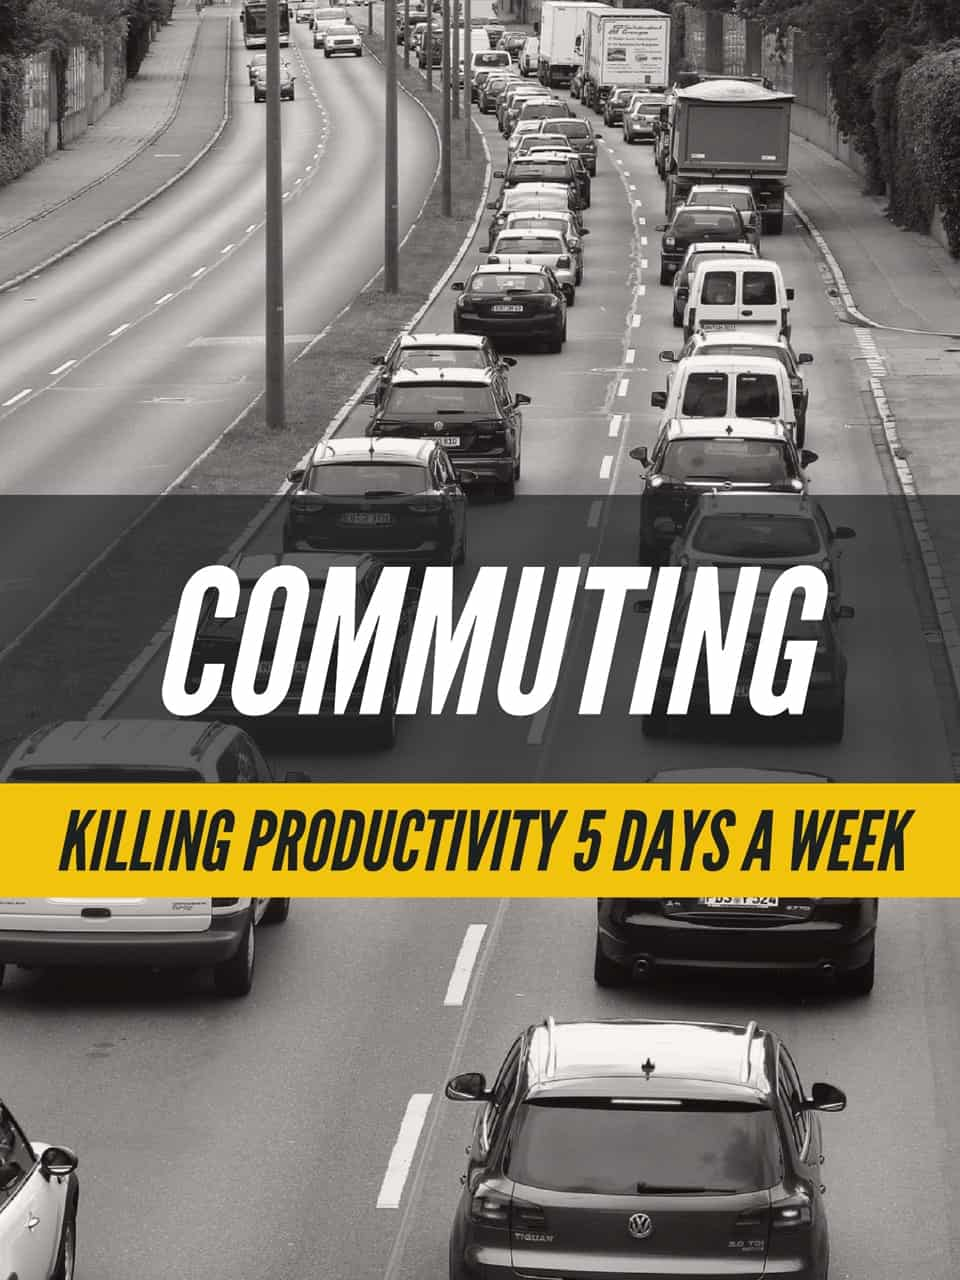 Commuting: Killing productivity 5 days a week!